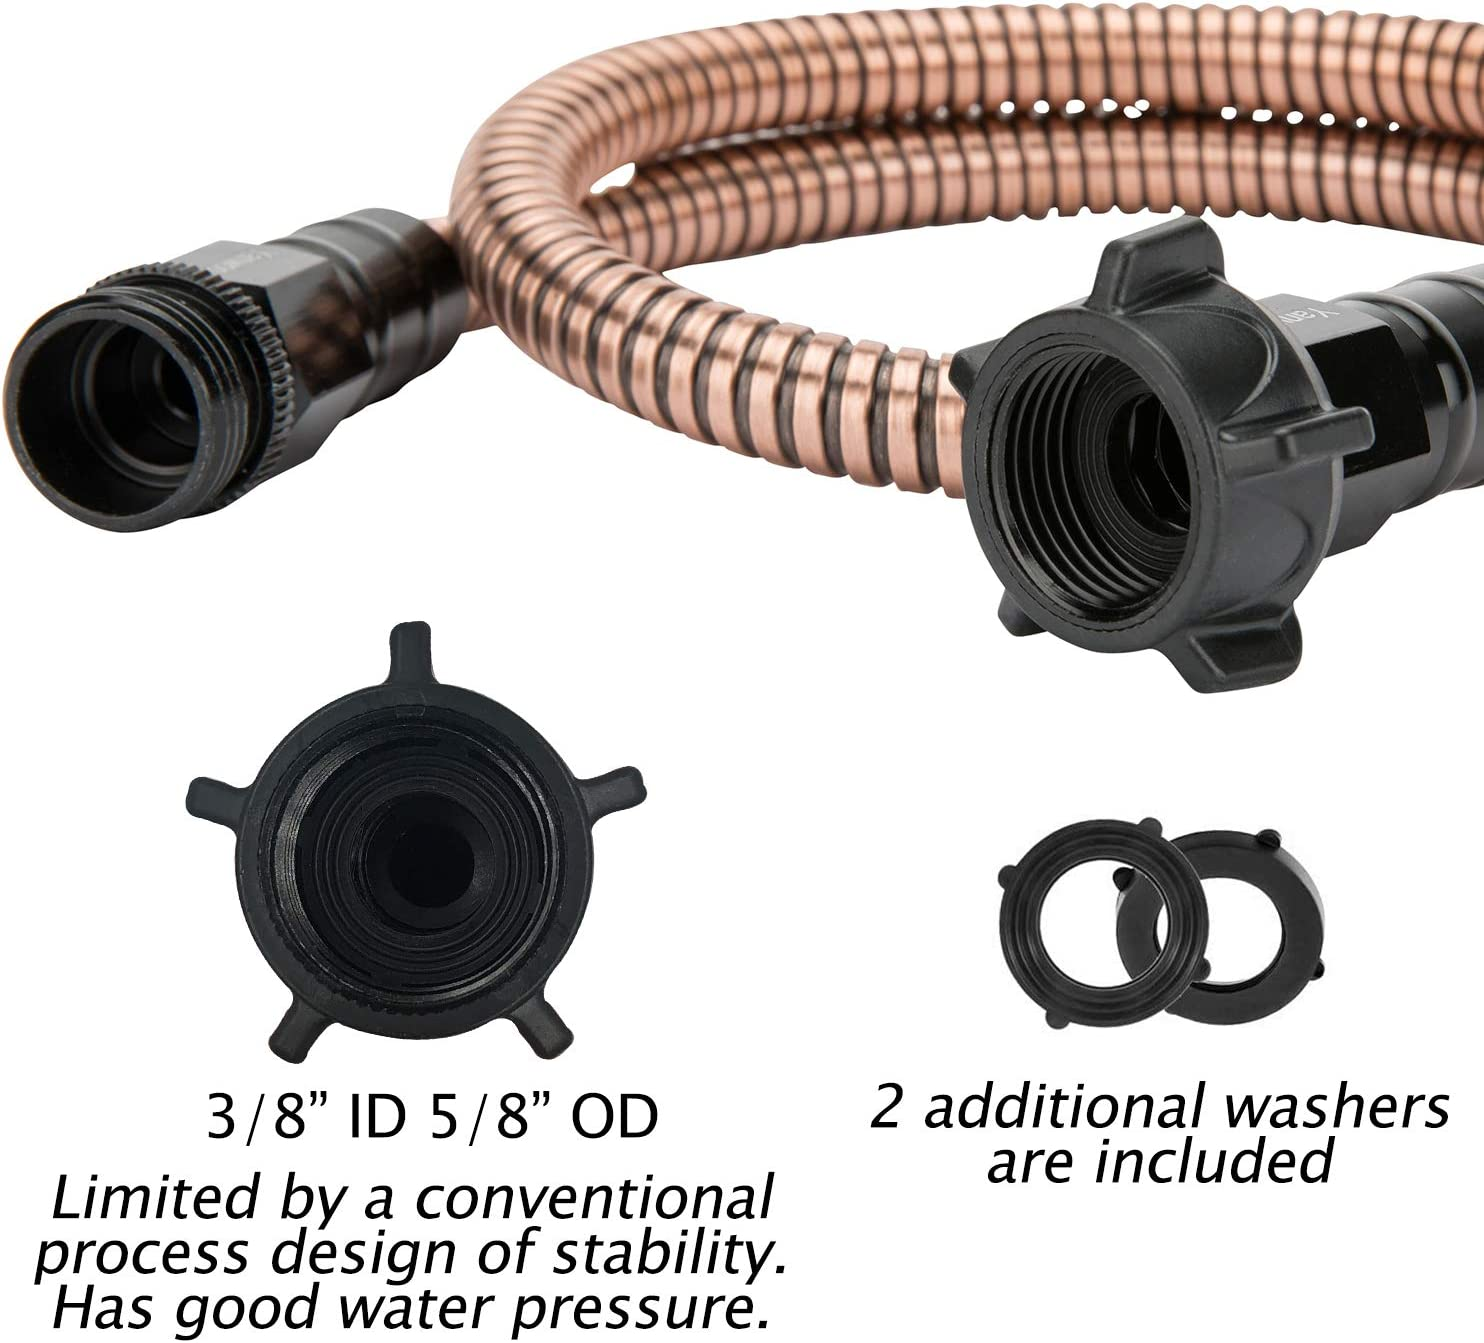 Flexible Bathroom Hose Portable Outdoor Hose Yanwoo 304 Stainless Steel Bronze Color 1.5 Feet Short Garden Hose